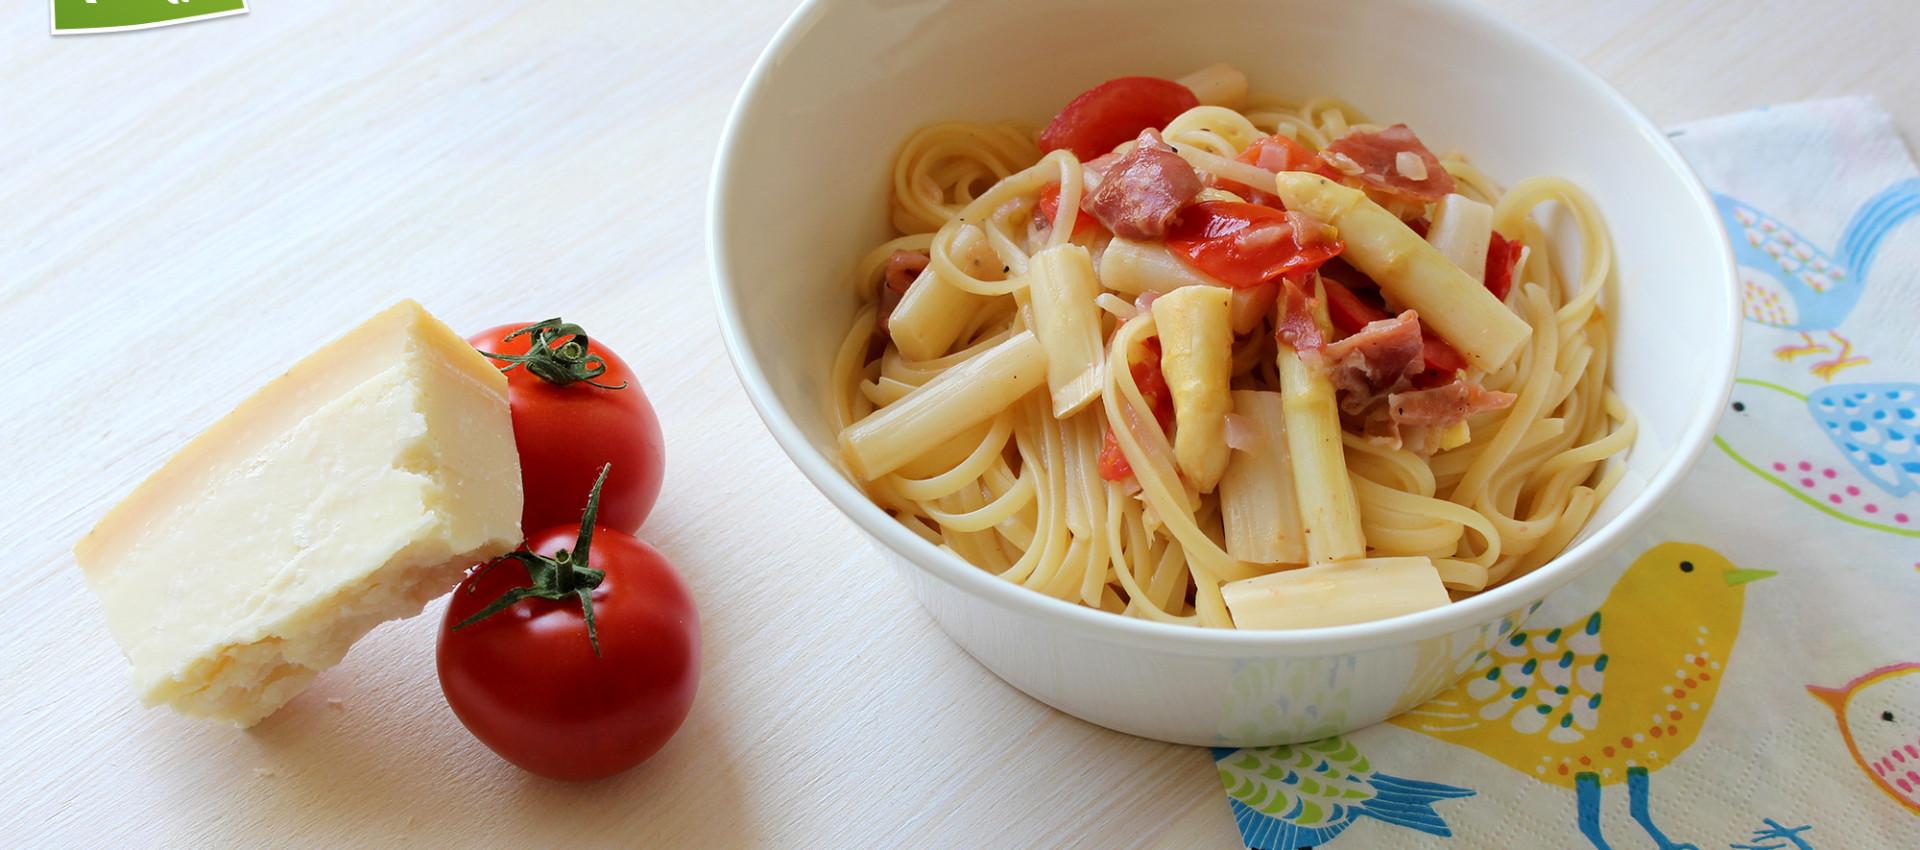 Rezept Pasta mit Spargel & Serrano Schinken - KochBock.de